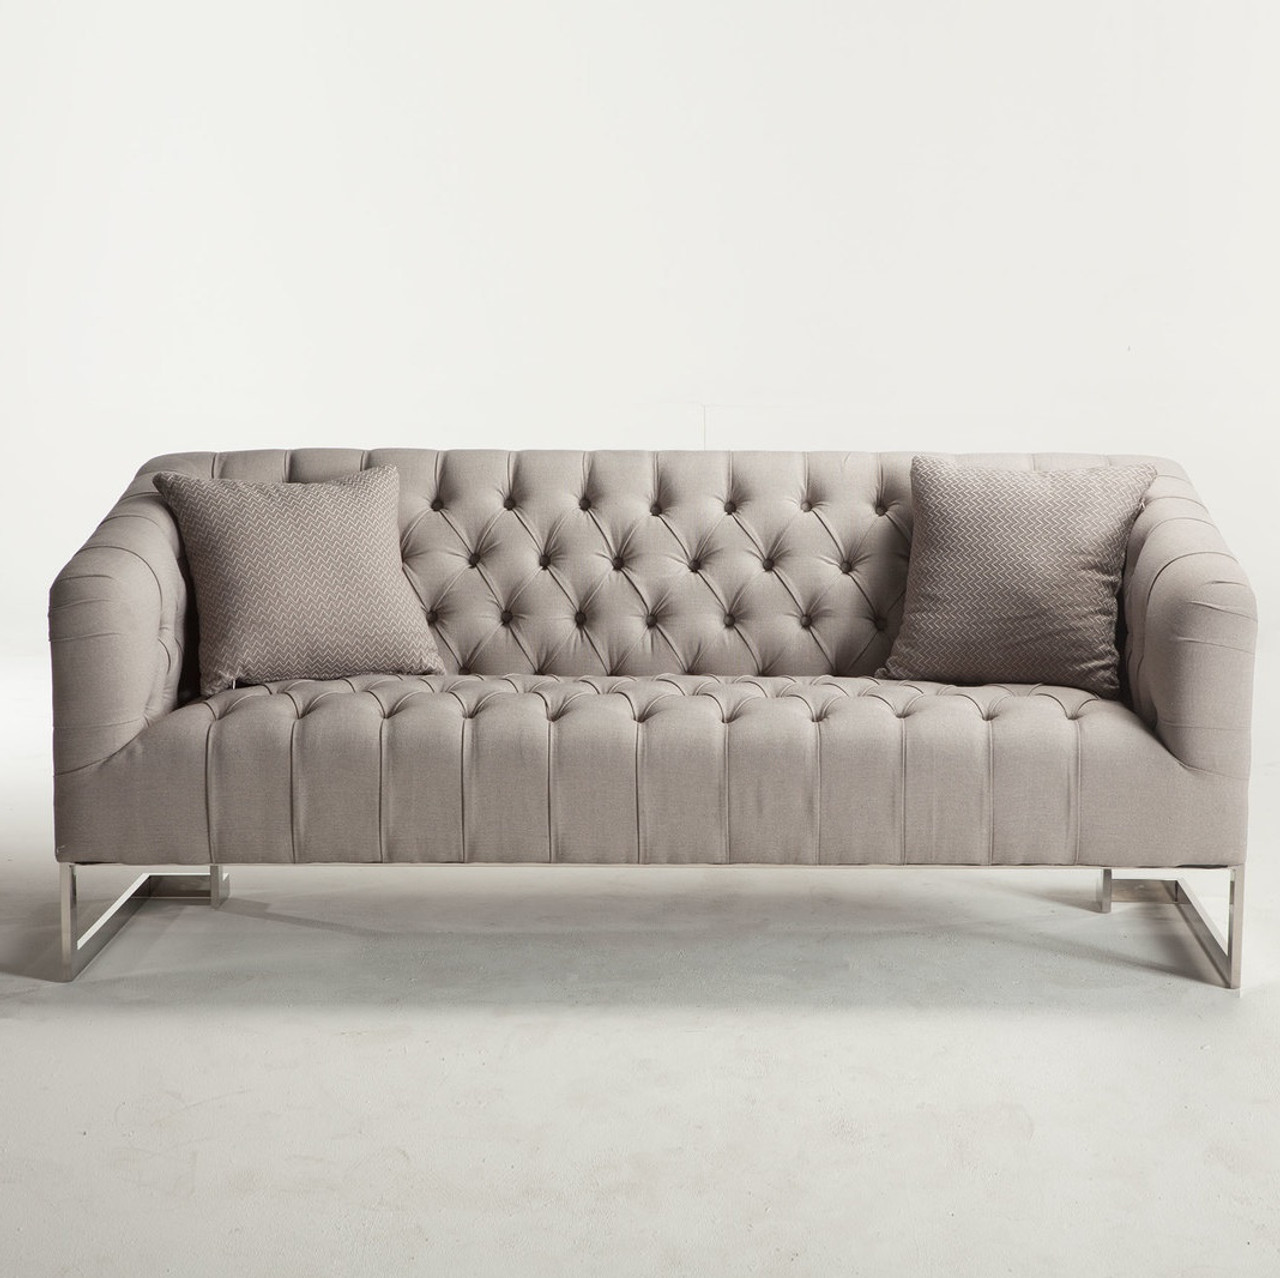 Contemporary Grey Sofa: Austin Modern Tufted Sofa - Grey